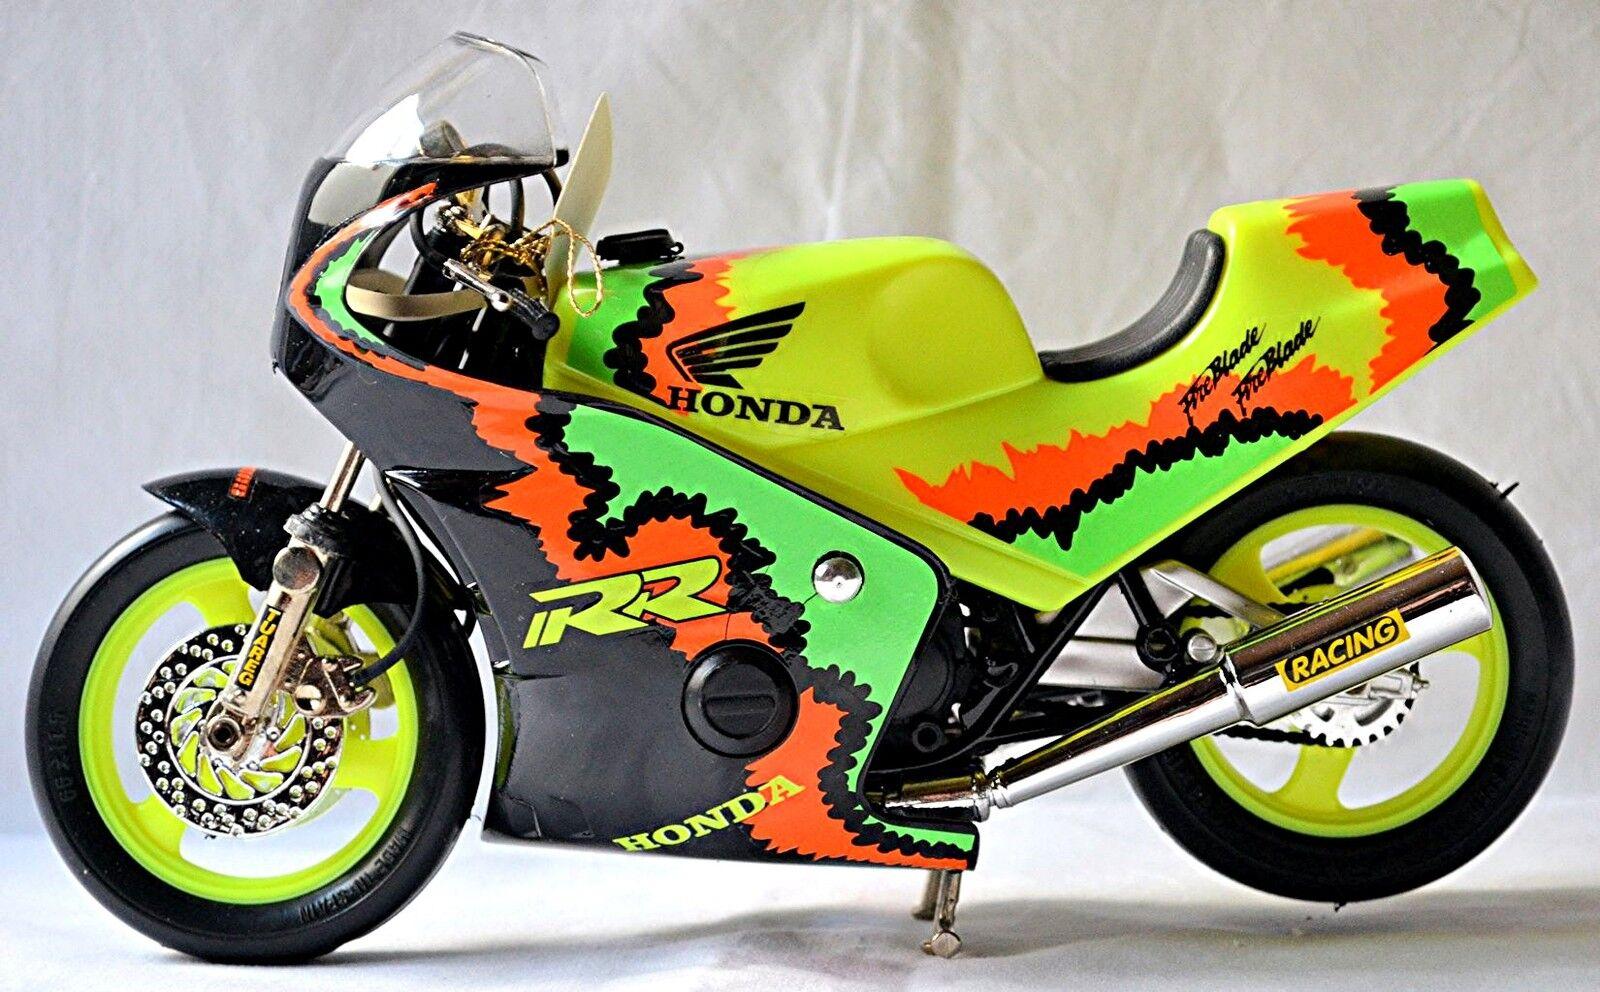 Le rythme cardiaque est pire que l'action! Honda CBR CBR CBR 900 RR Fire Blade 1992 Noir Noir 1:10 | Service Supremacy  41caaa